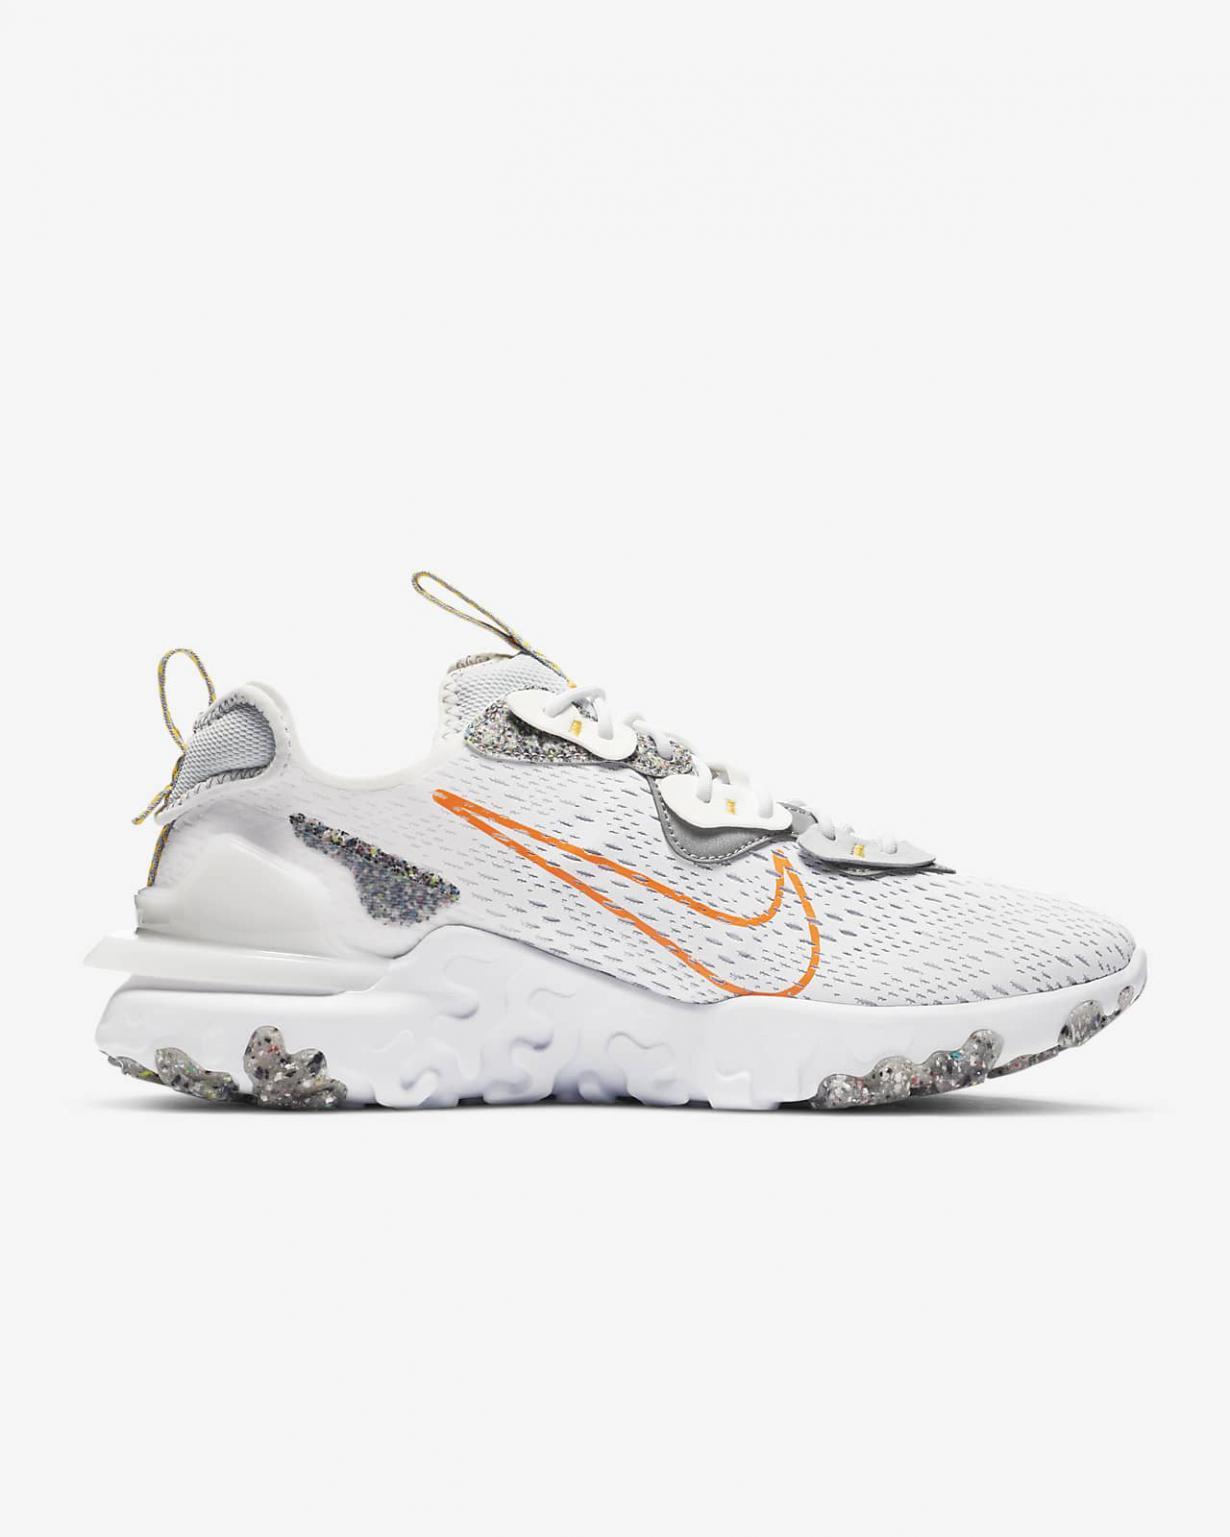 Lifestyle Homme | React Vision Blanc/Orange laser/Voile/Orange total | Nike < Gooddaytricities